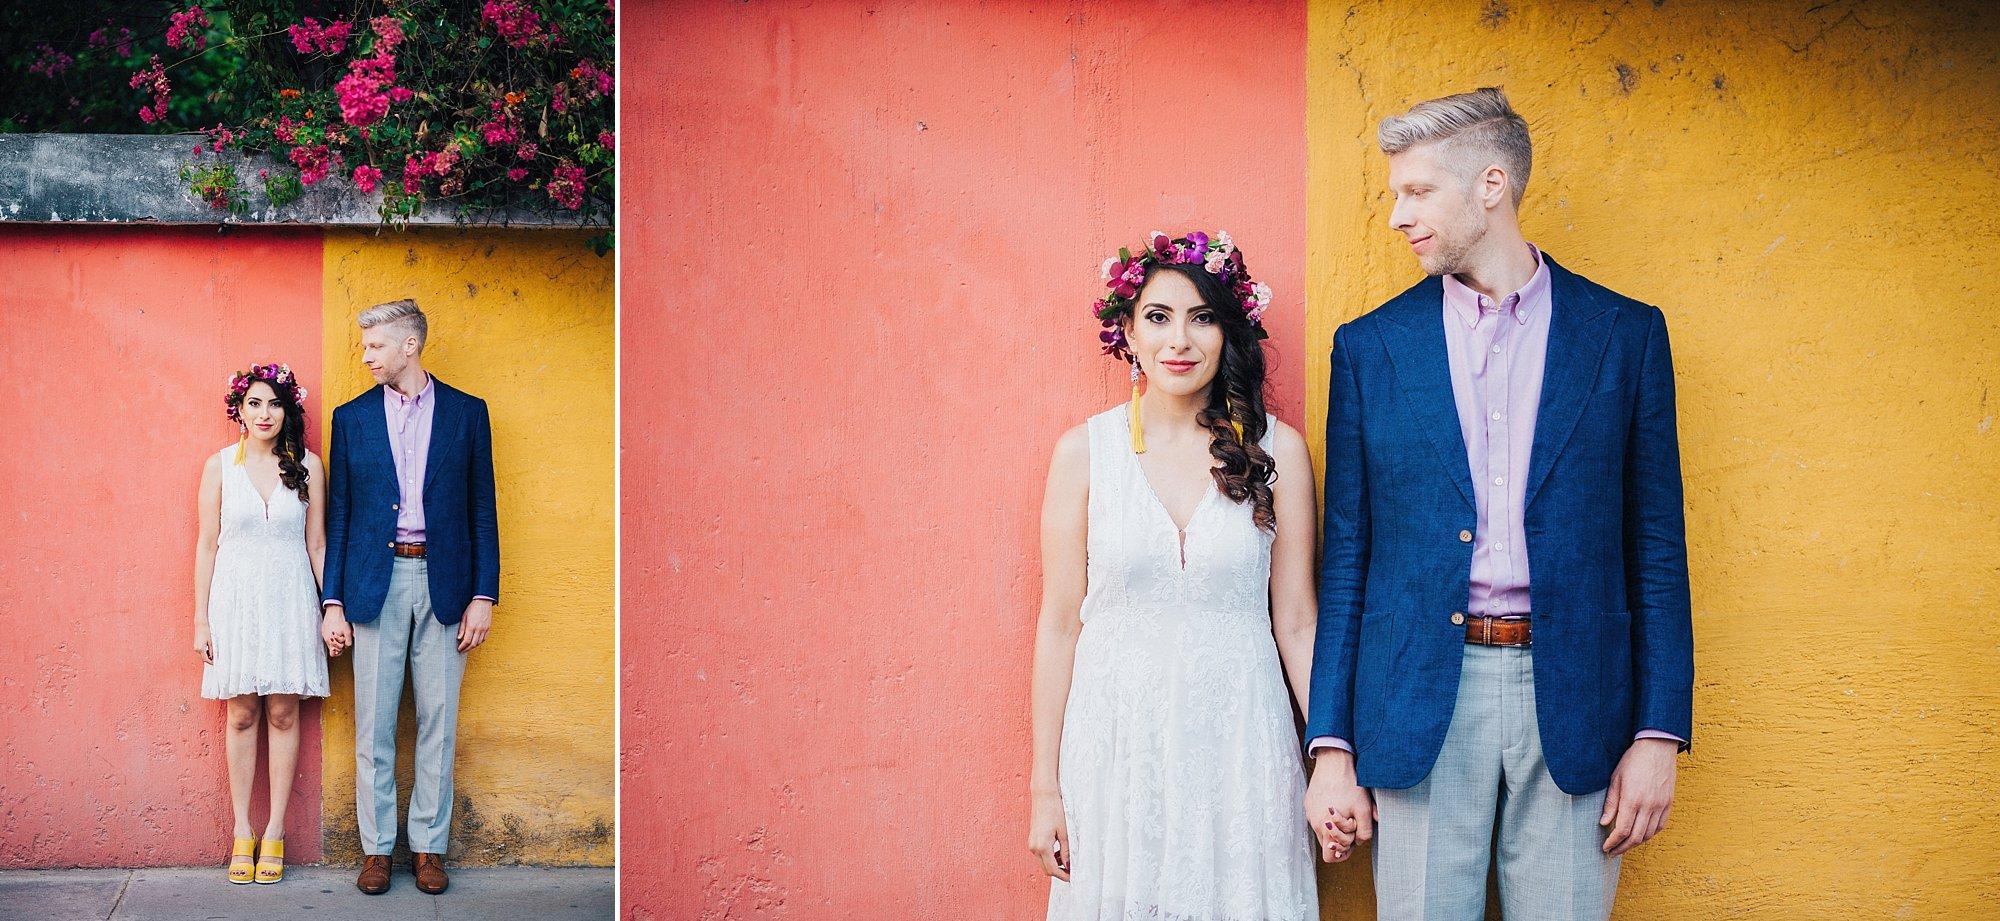 alex-yazmin-wedding-photographer-antigua-guatemala-031